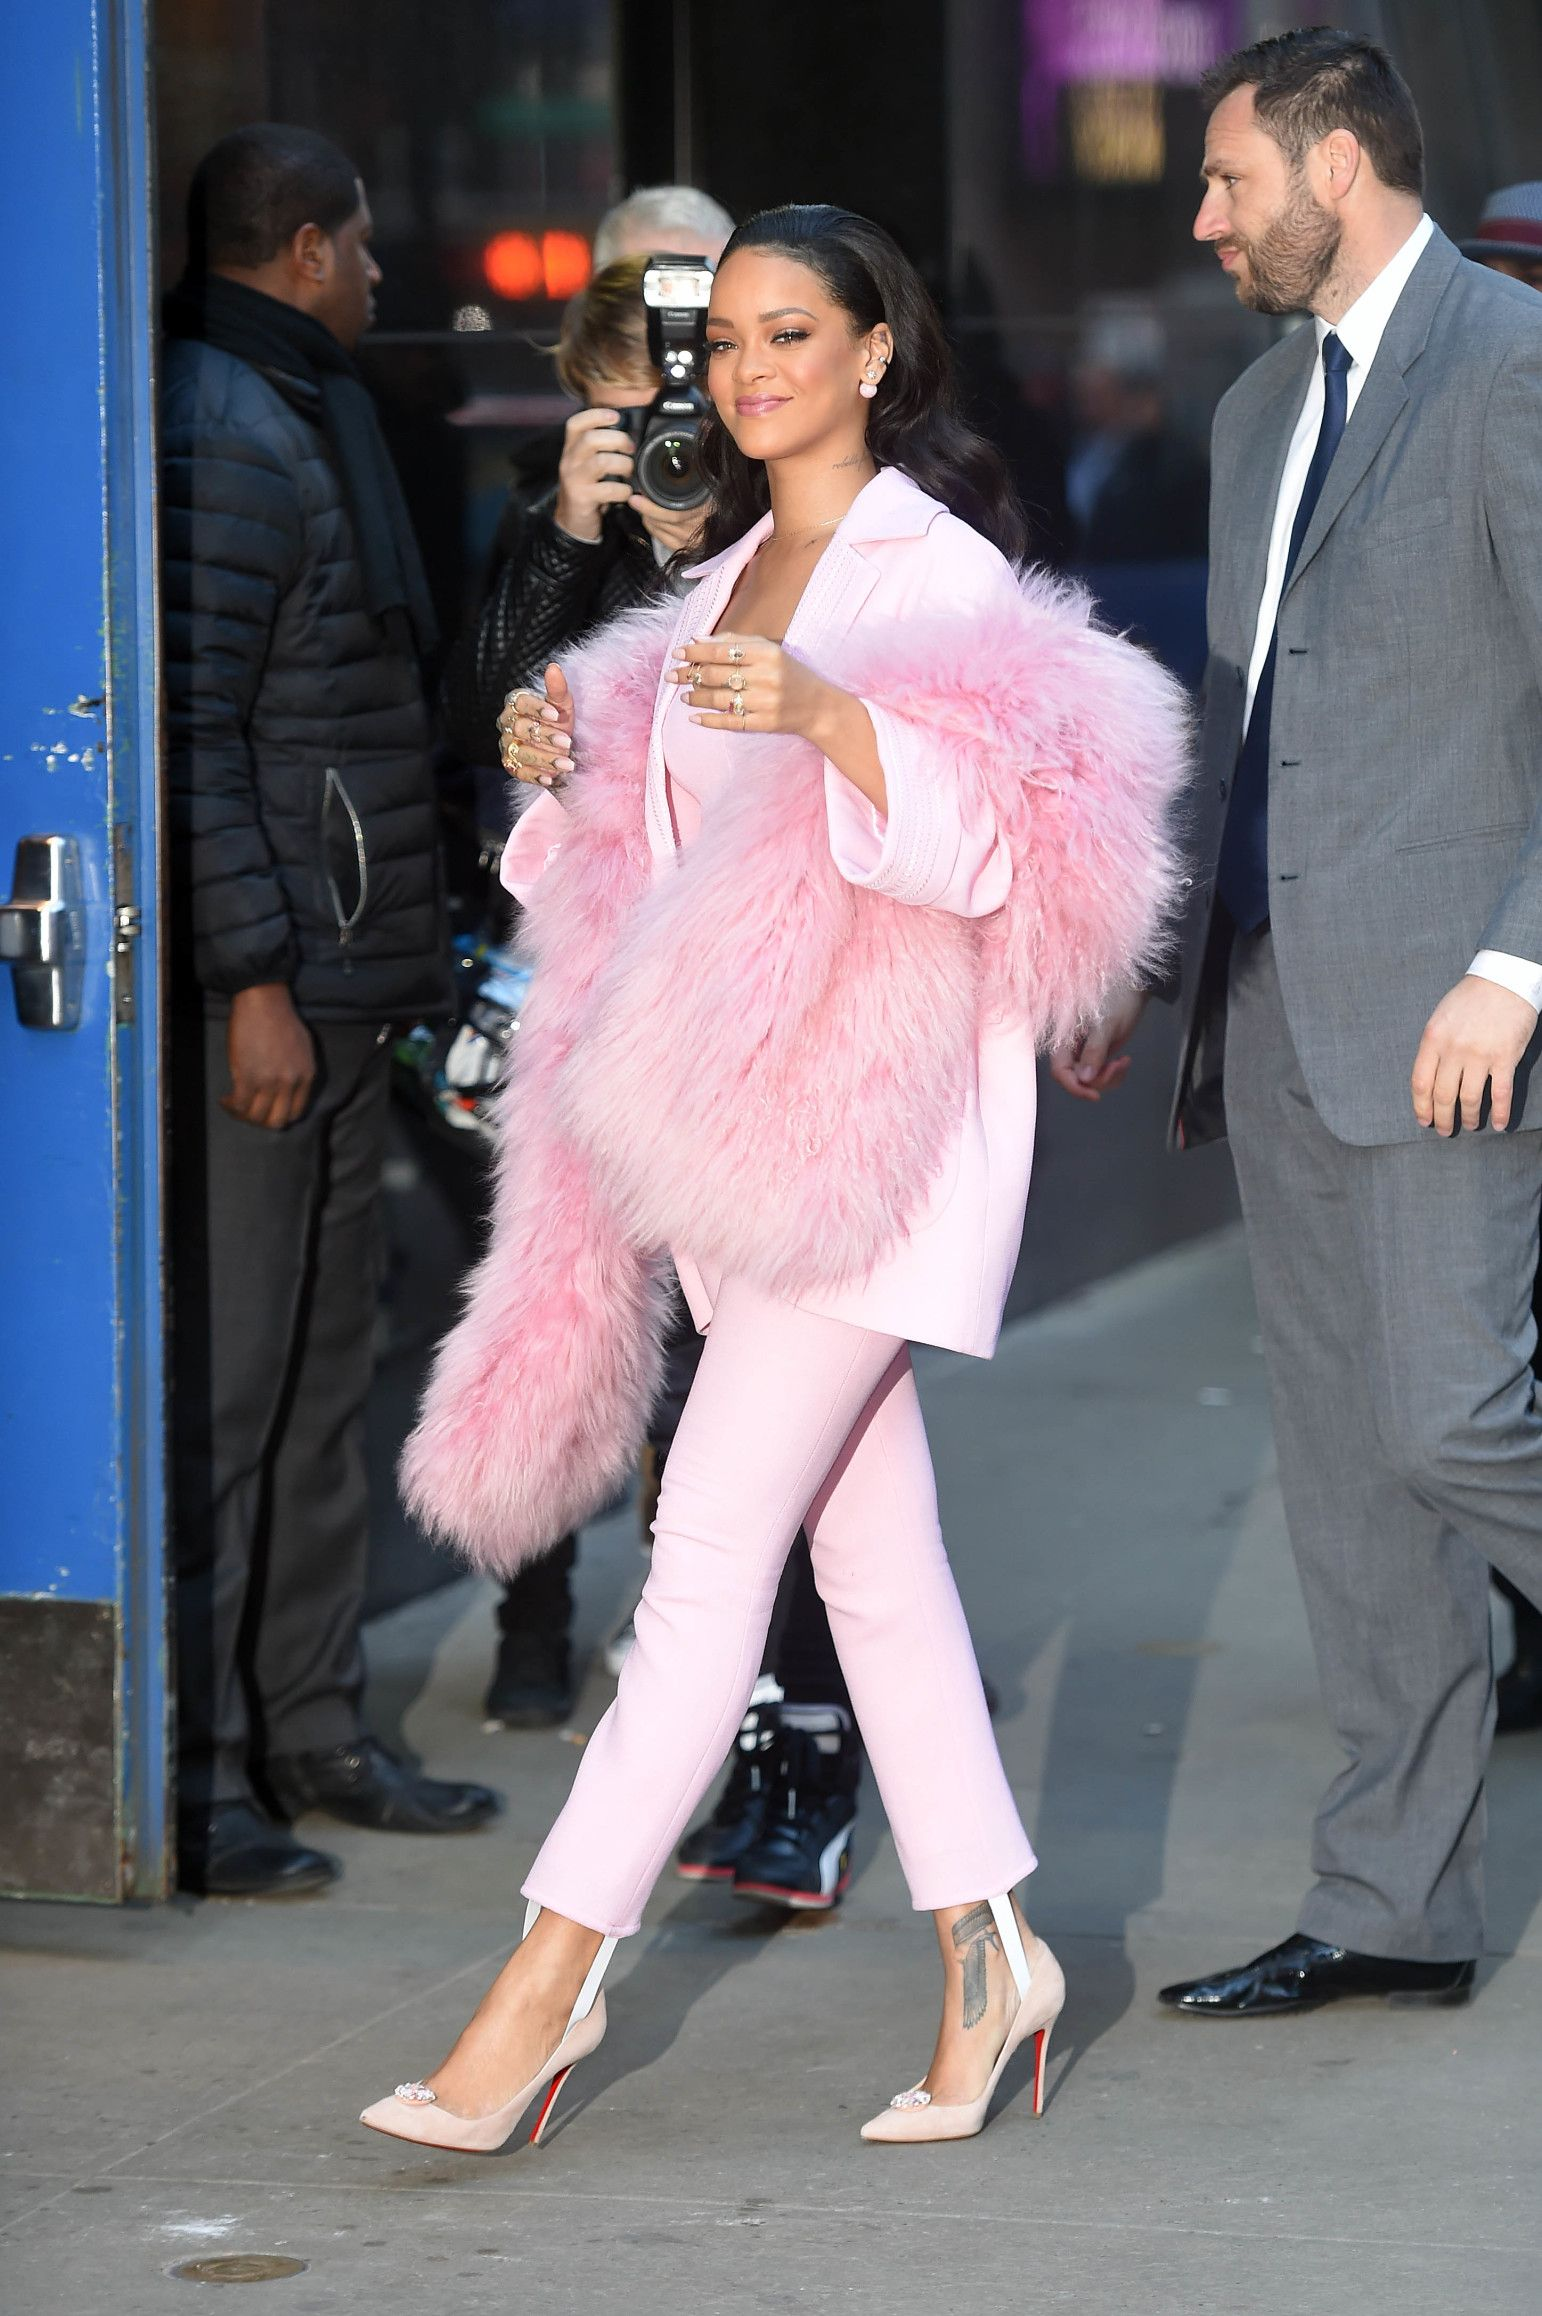 Asombroso Vestido De Fiesta Rihanna Viñeta - Colección de Vestidos ...